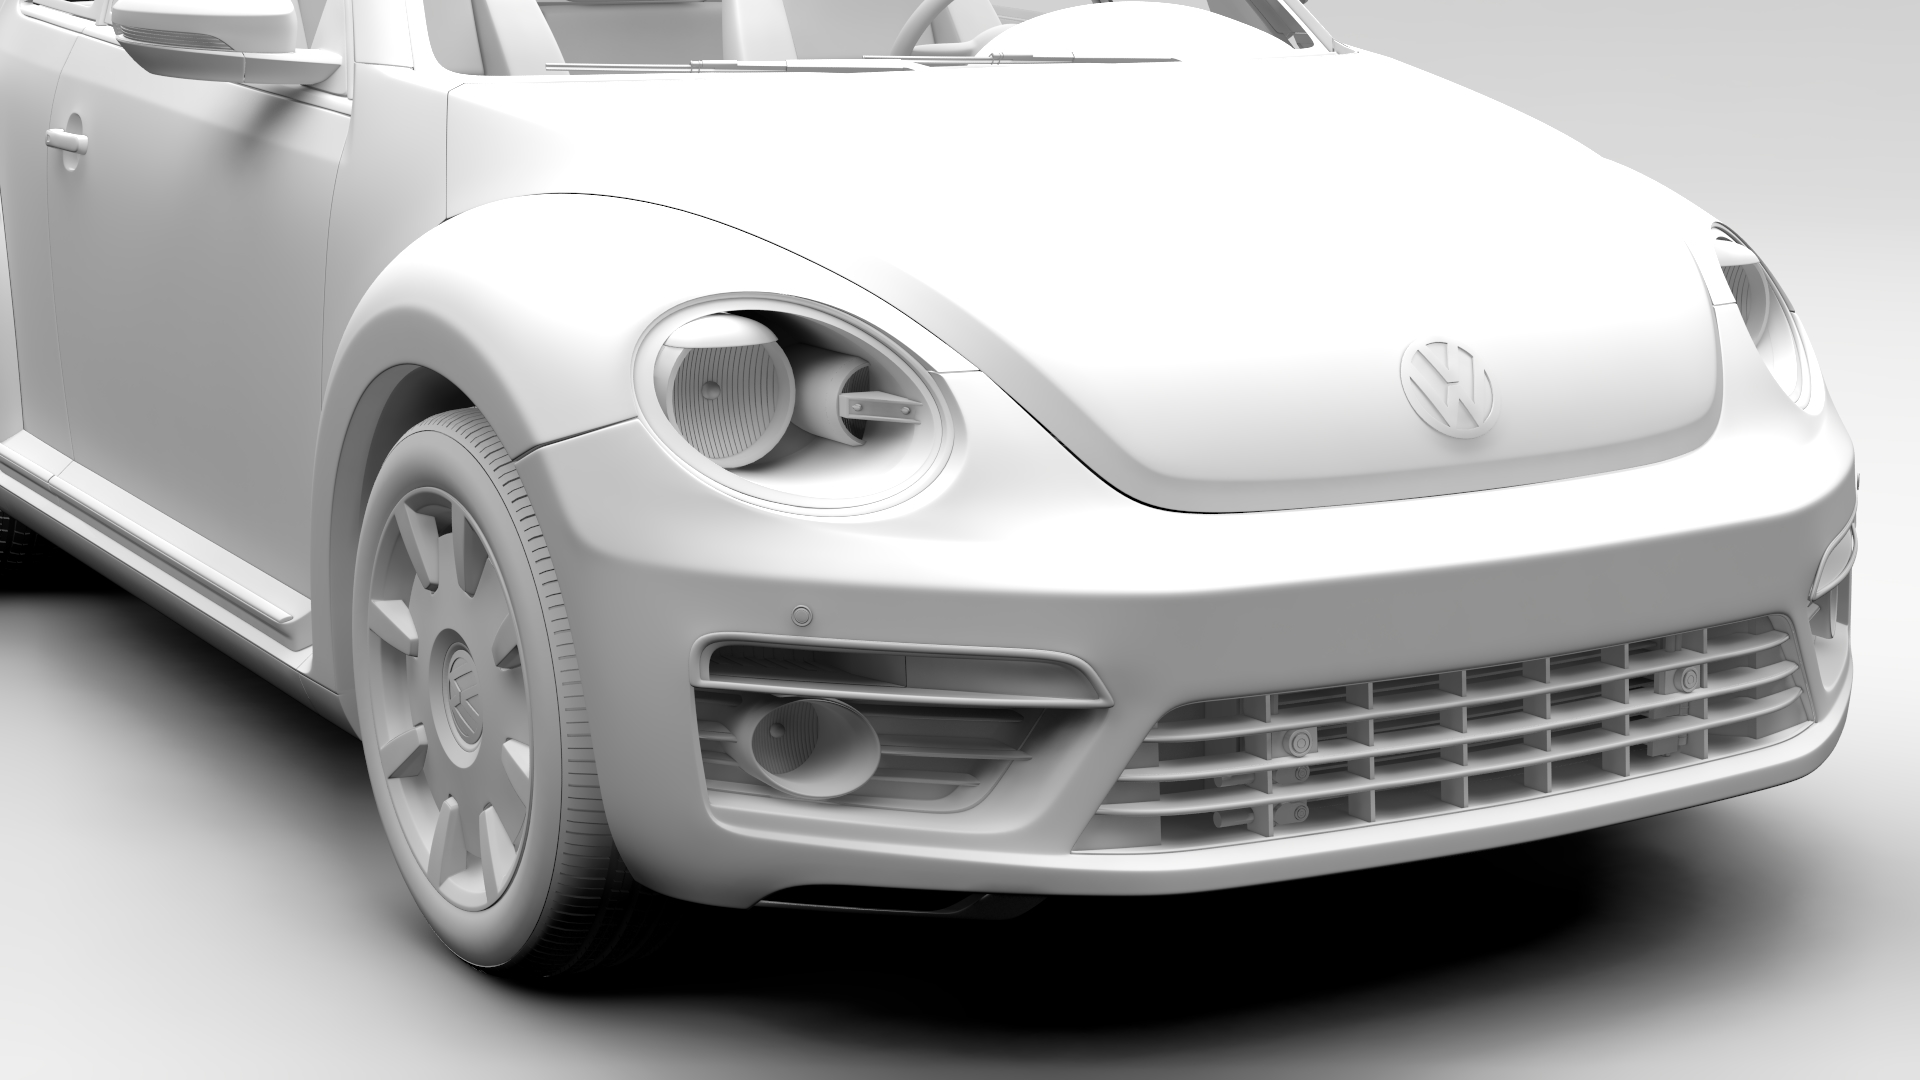 vw beetle turbo 2017 3d model 3ds max fbx c4d lwo ma mb hrc xsi obj 221670